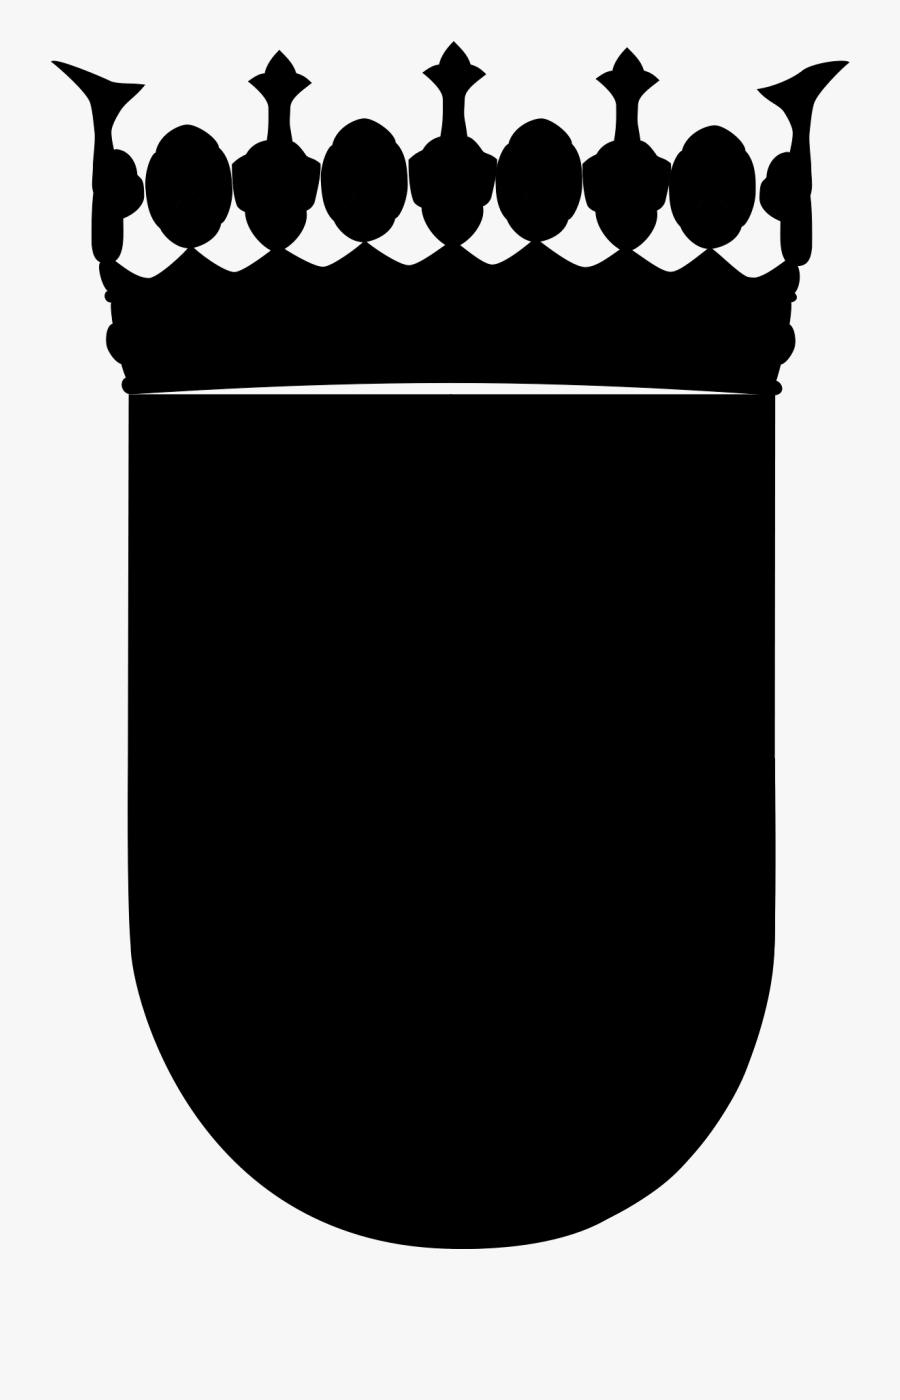 Kingdom Coat Government Of Arms Escutcheon President - Illustration, Transparent Clipart